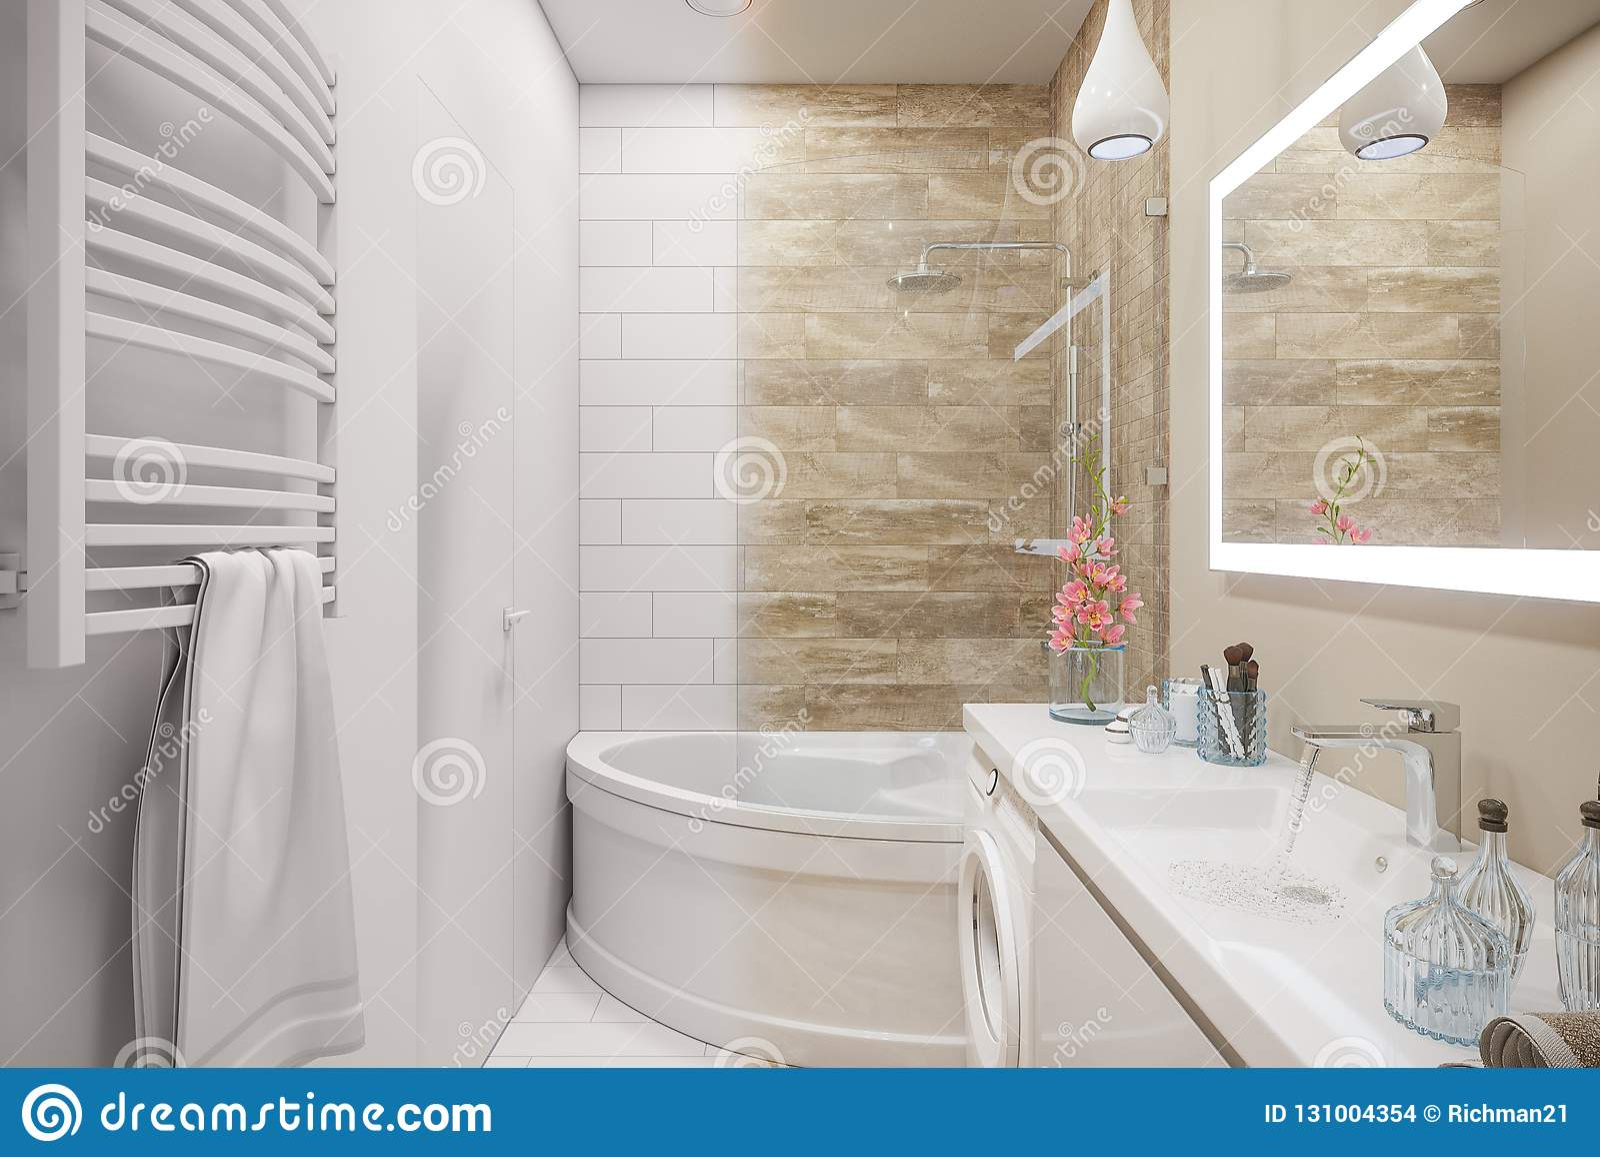 3d Illustration Of An Interior Design Of A White Minimalist Bathroom Stock Illustration Illustration Of Empty Modern 131004354